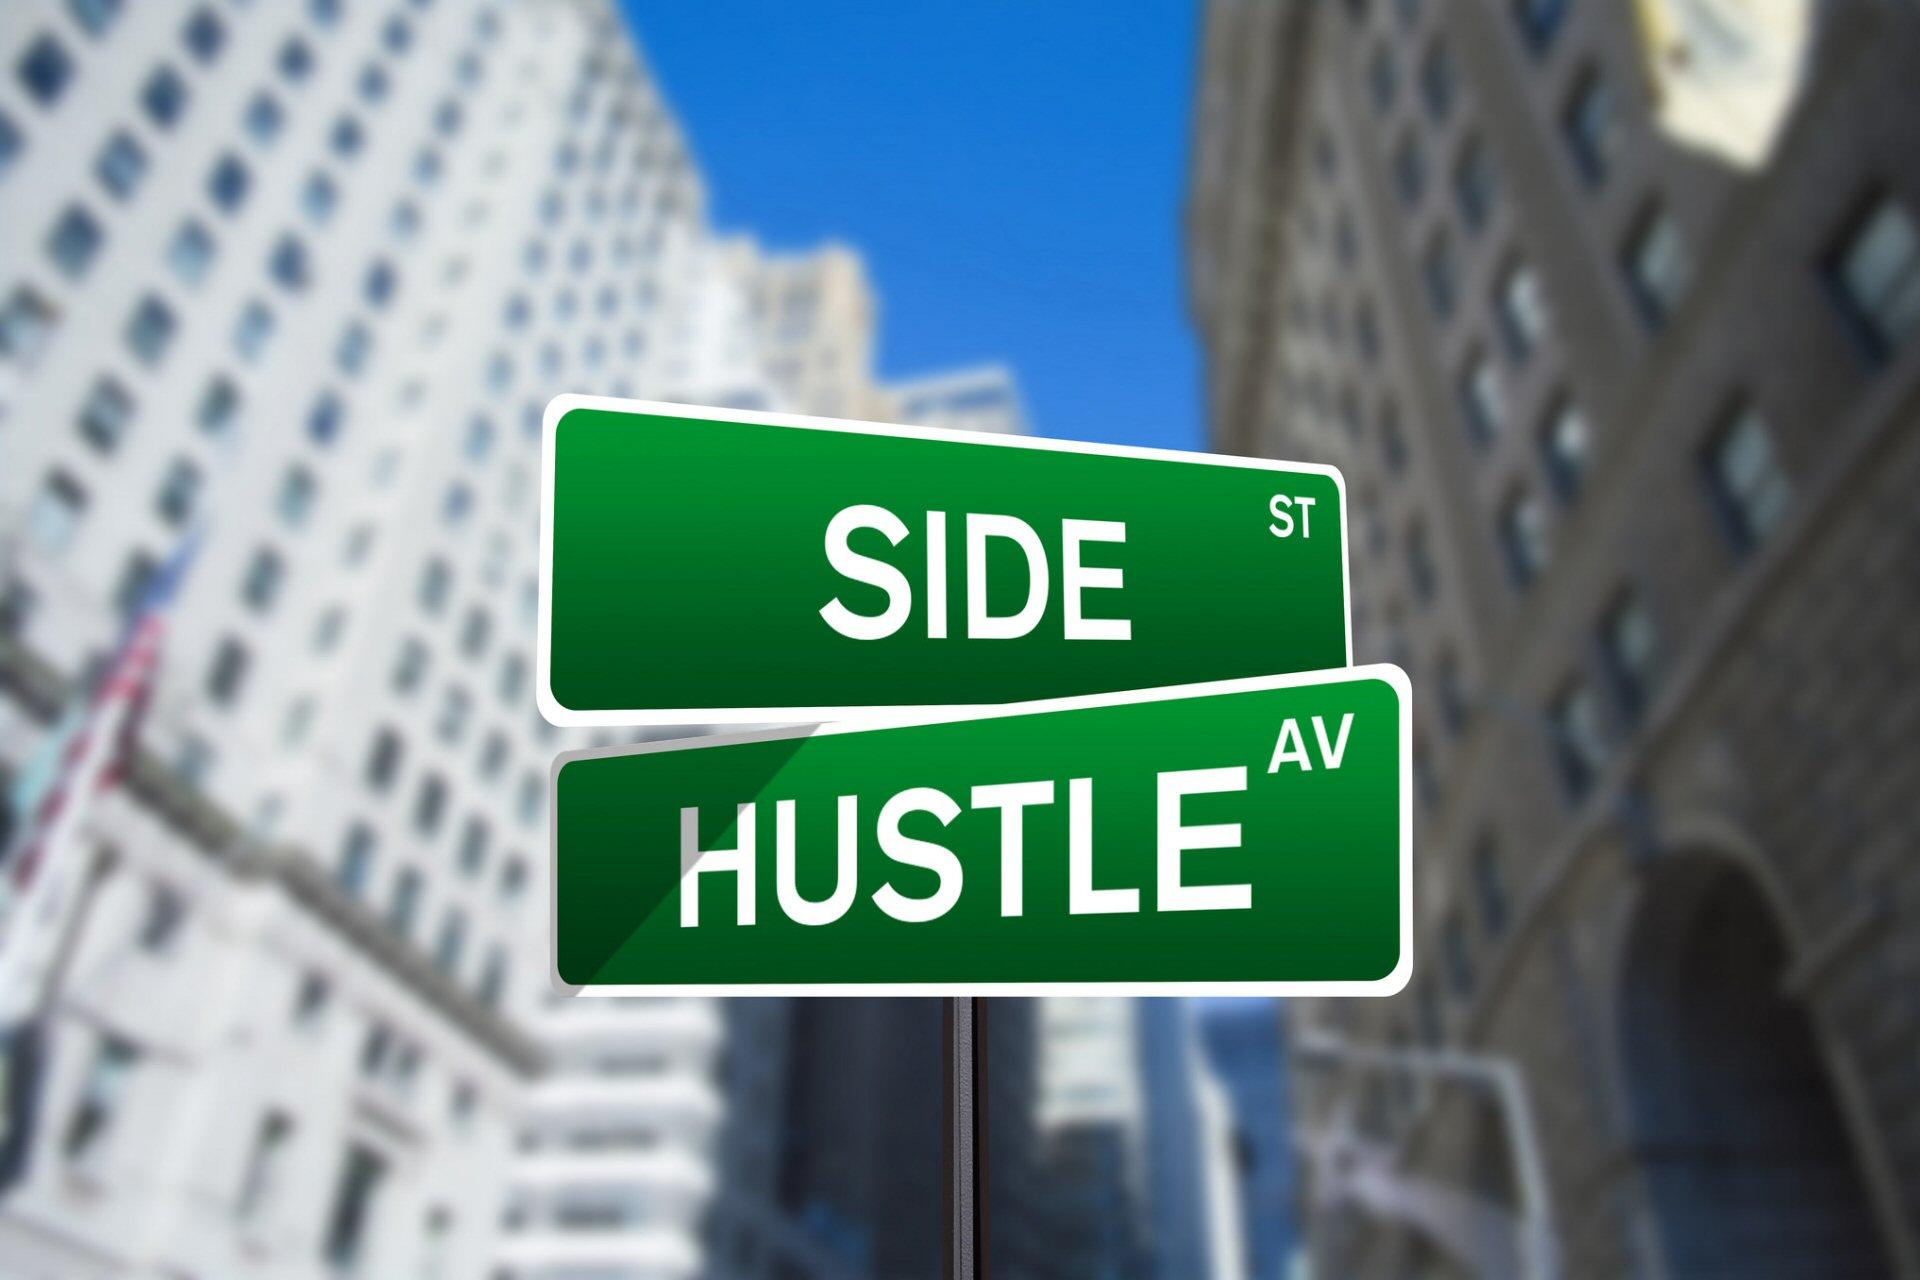 Are side hustle jobs really viable?